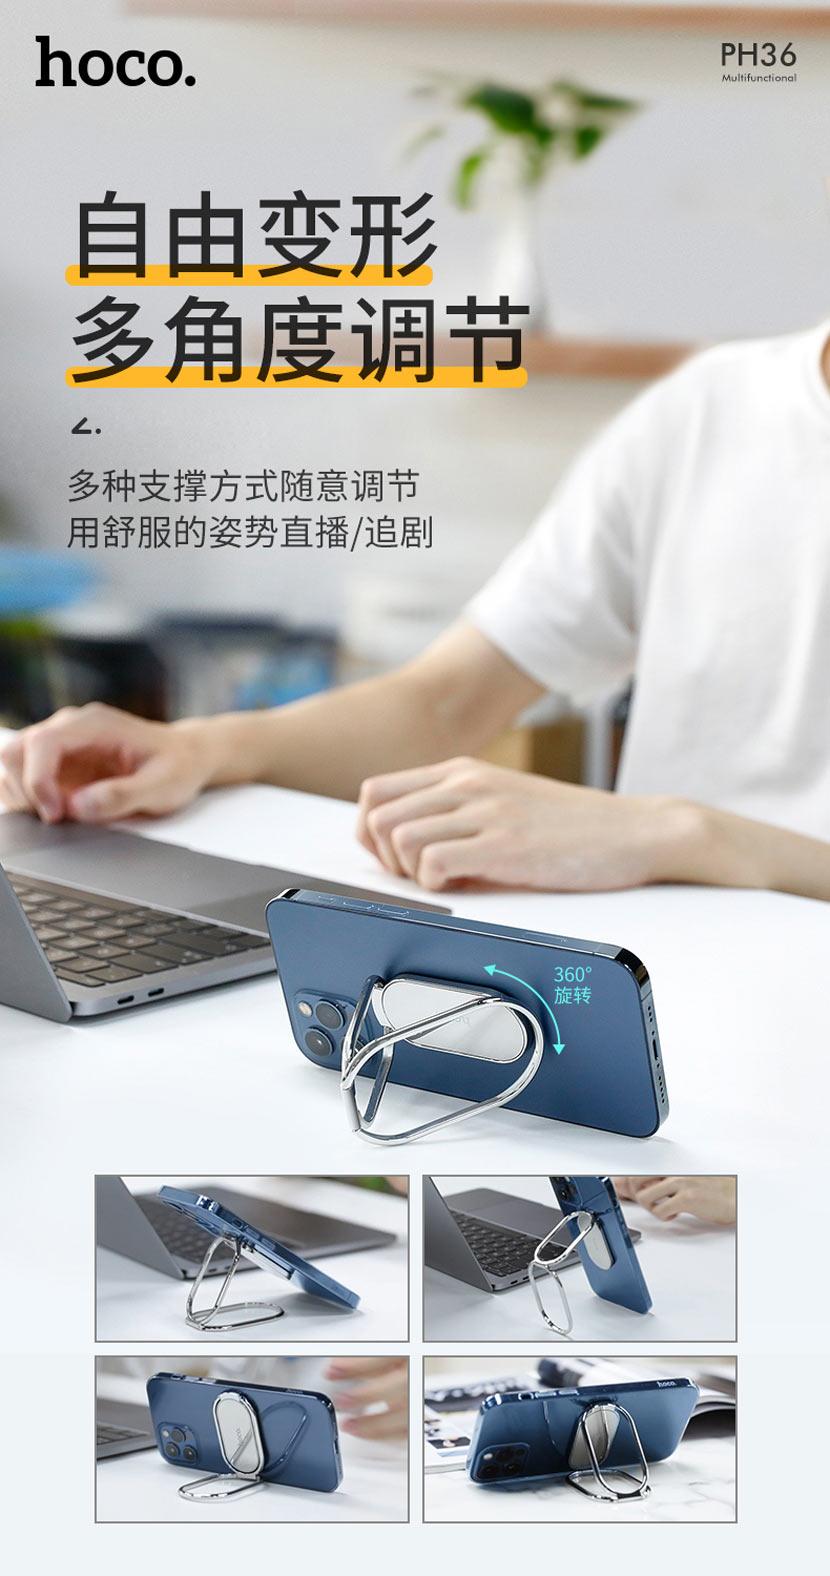 hoco news ph36 emma metal multifunctional folding stand transformation cn